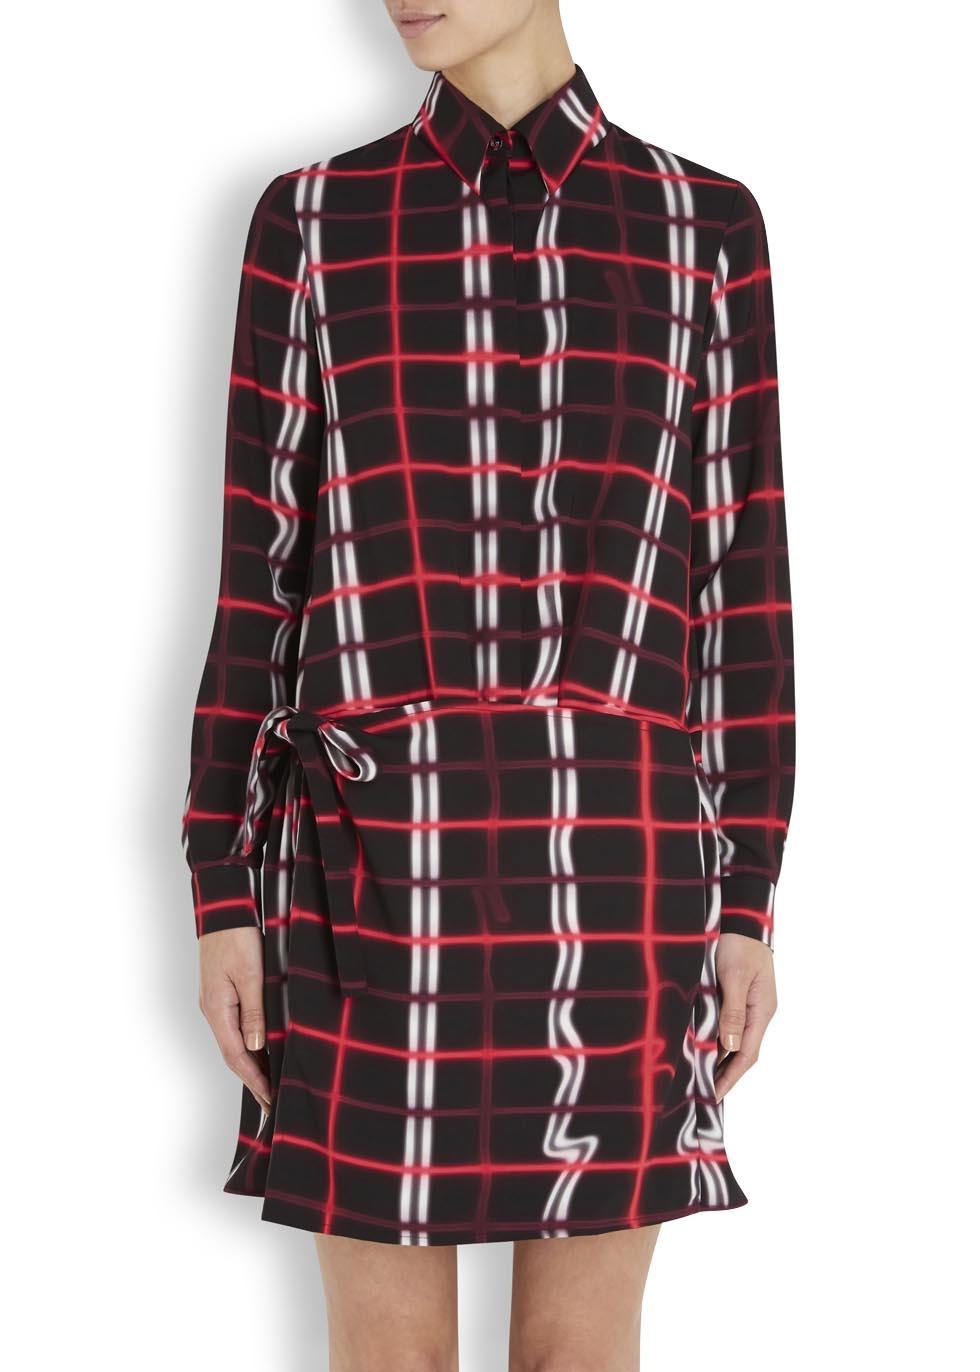 kenzo-black-black-checked-print-crepe-dress-product-1-24080729-0-143053194-normal.jpeg